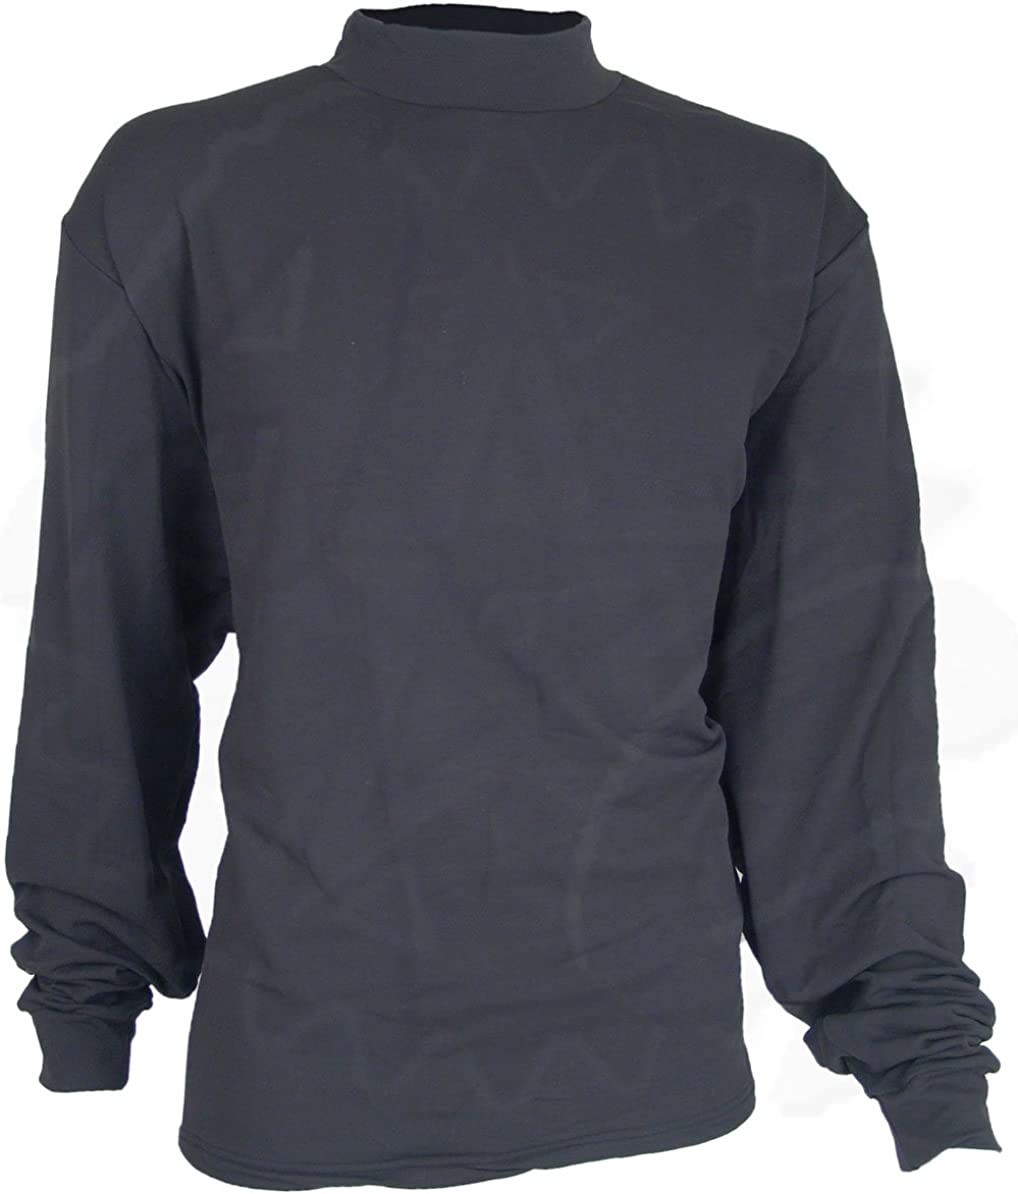 DSCP US Military Thermal Mock Turtleneck Long Sleeve Jersey Shirt, Black